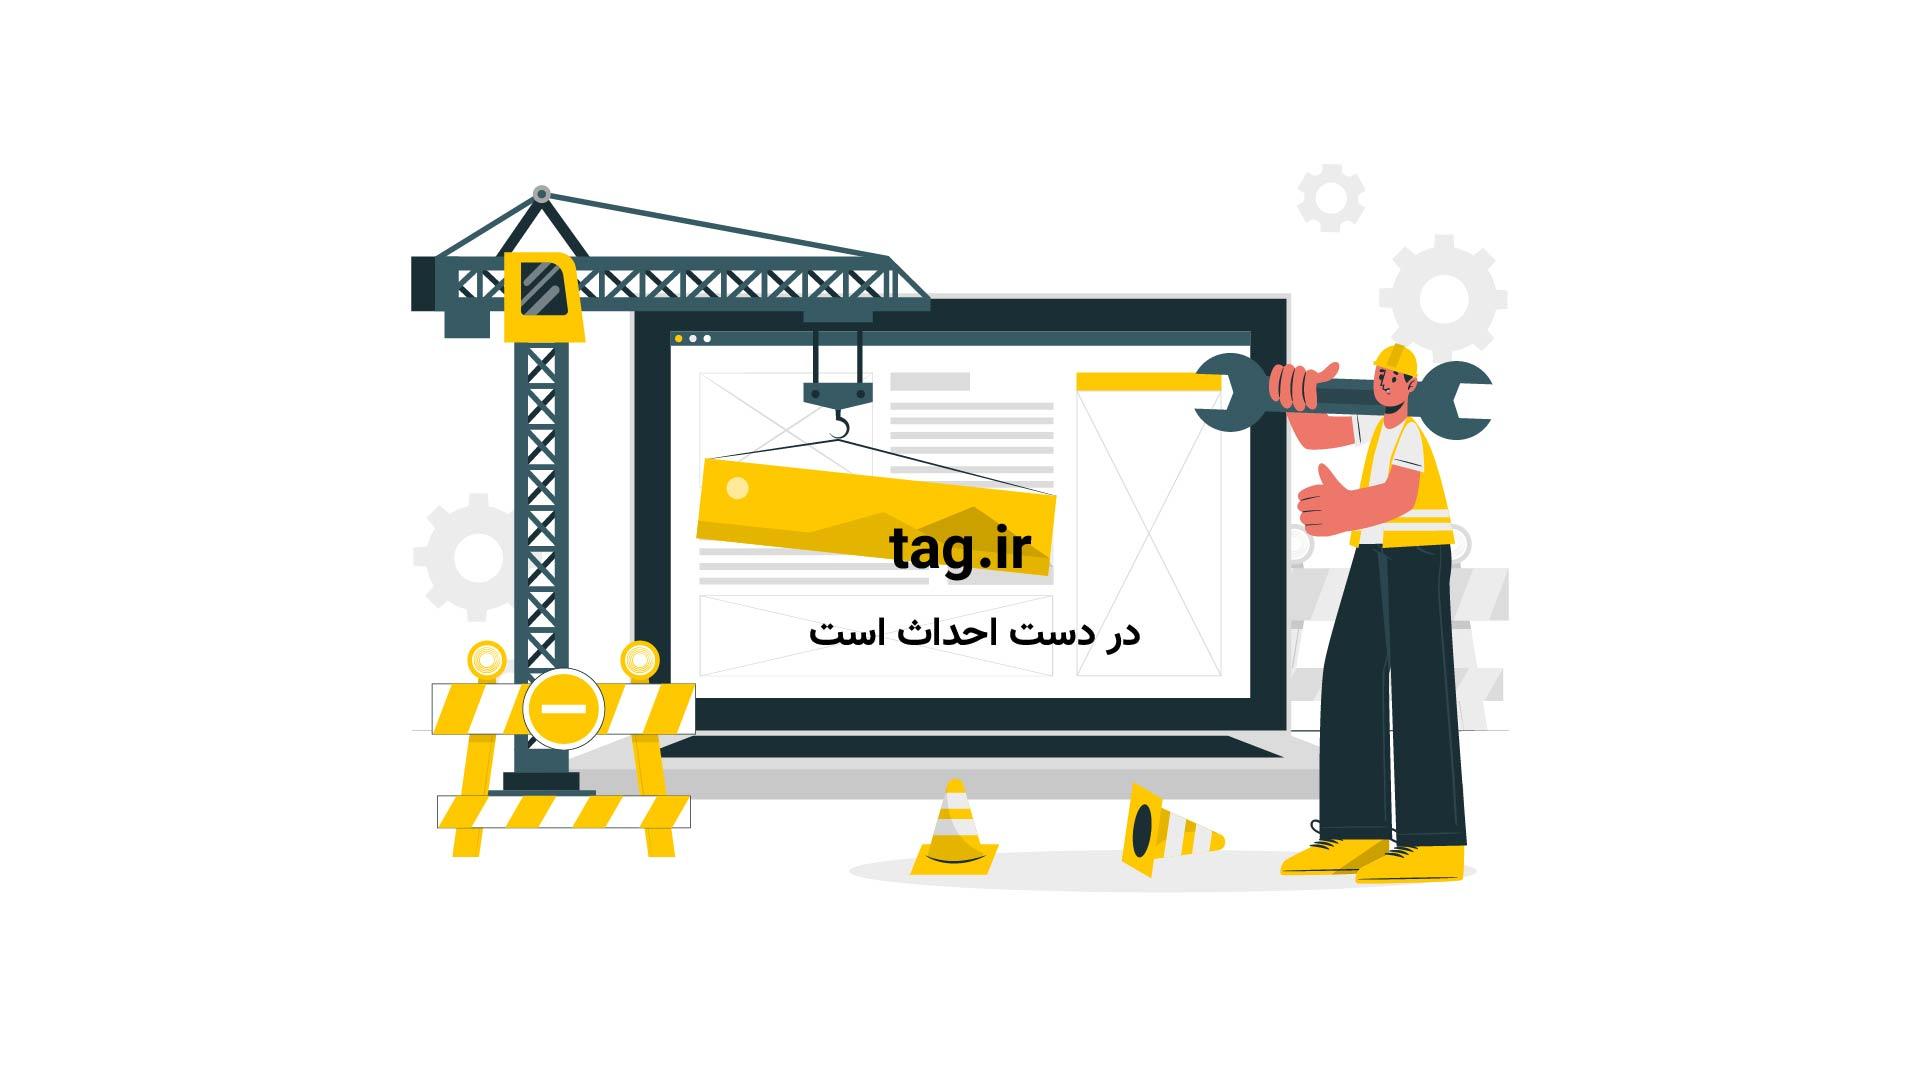 تیم ملی پرتغال | تگ